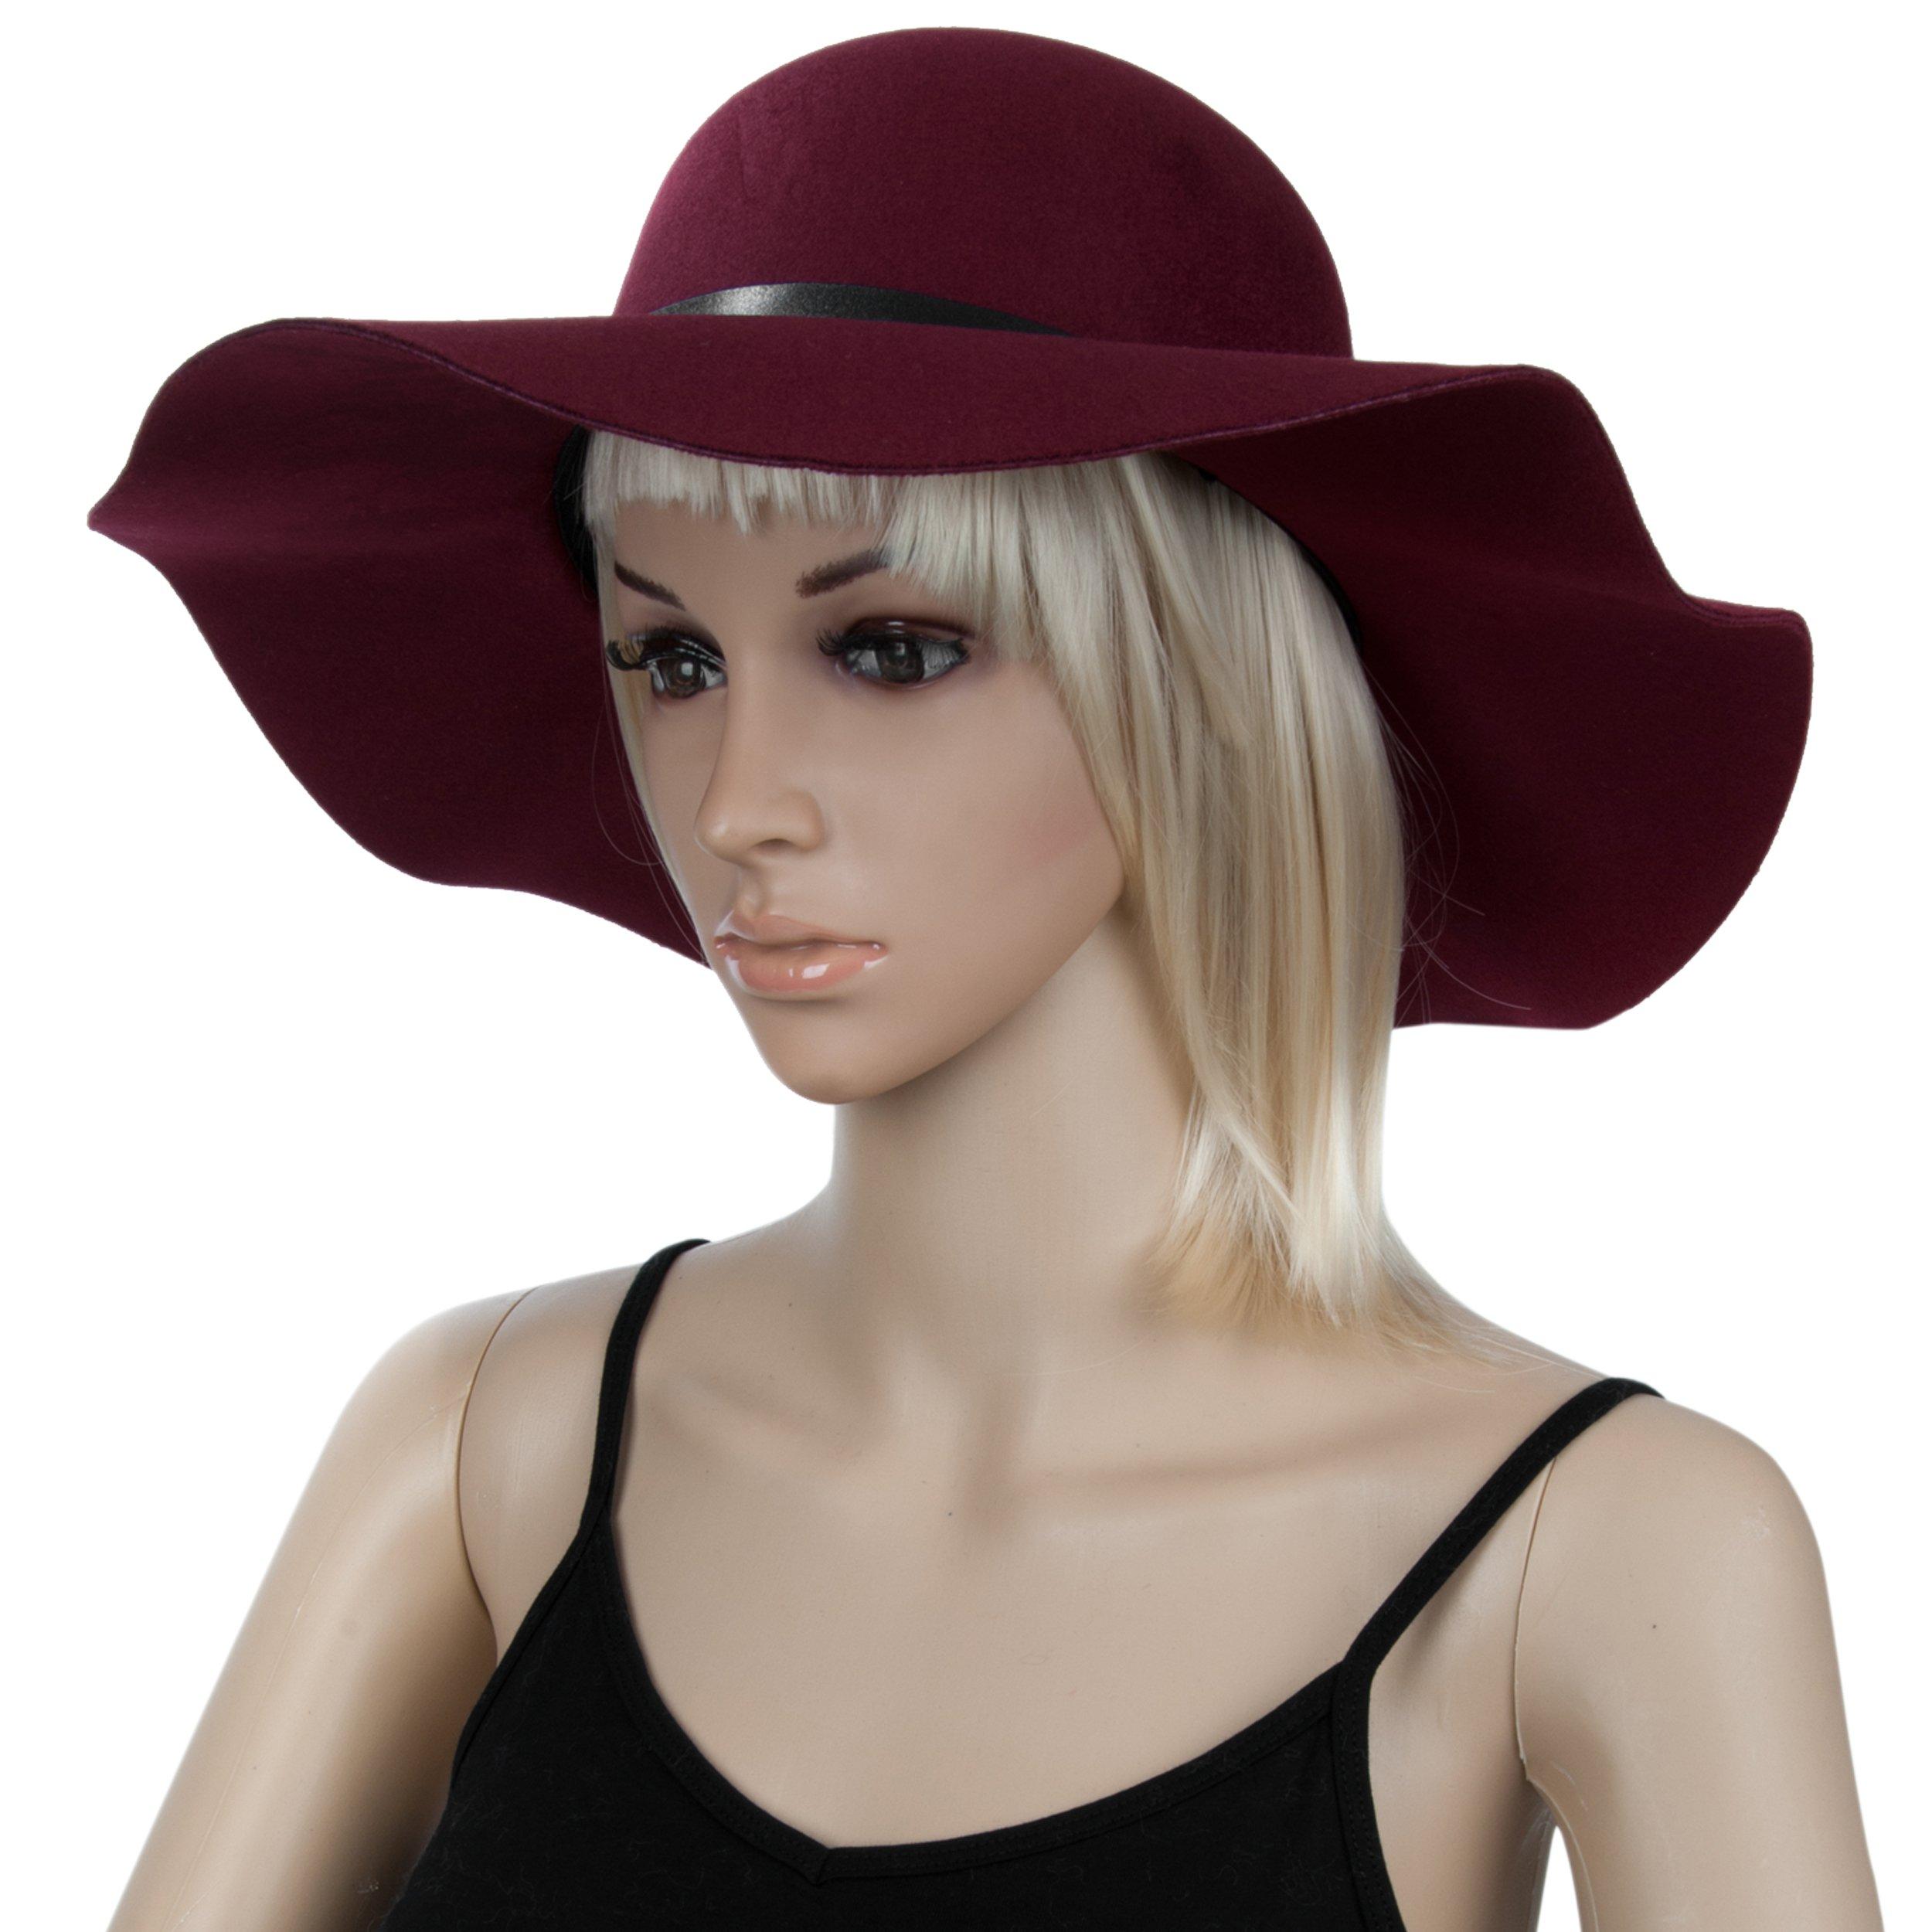 Aerusi Women's Vintage Classic Style Wool Felt Floppy Spring Fall Winter Fedora Hat Buckle Design